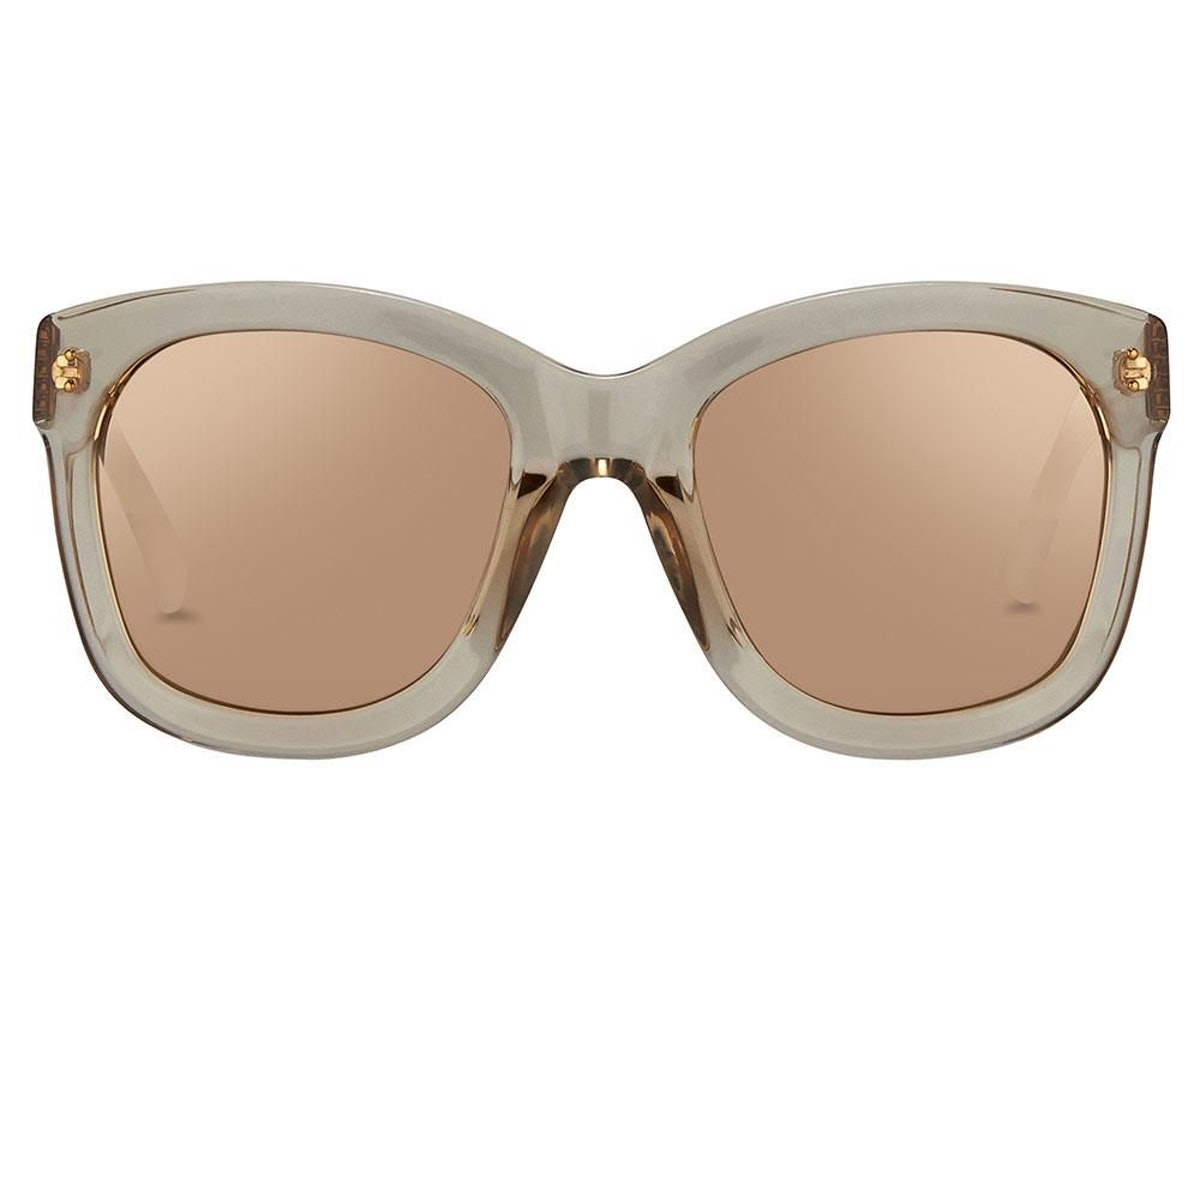 Linda Farrow 513 C4 Oversized Sunglasses: additional image